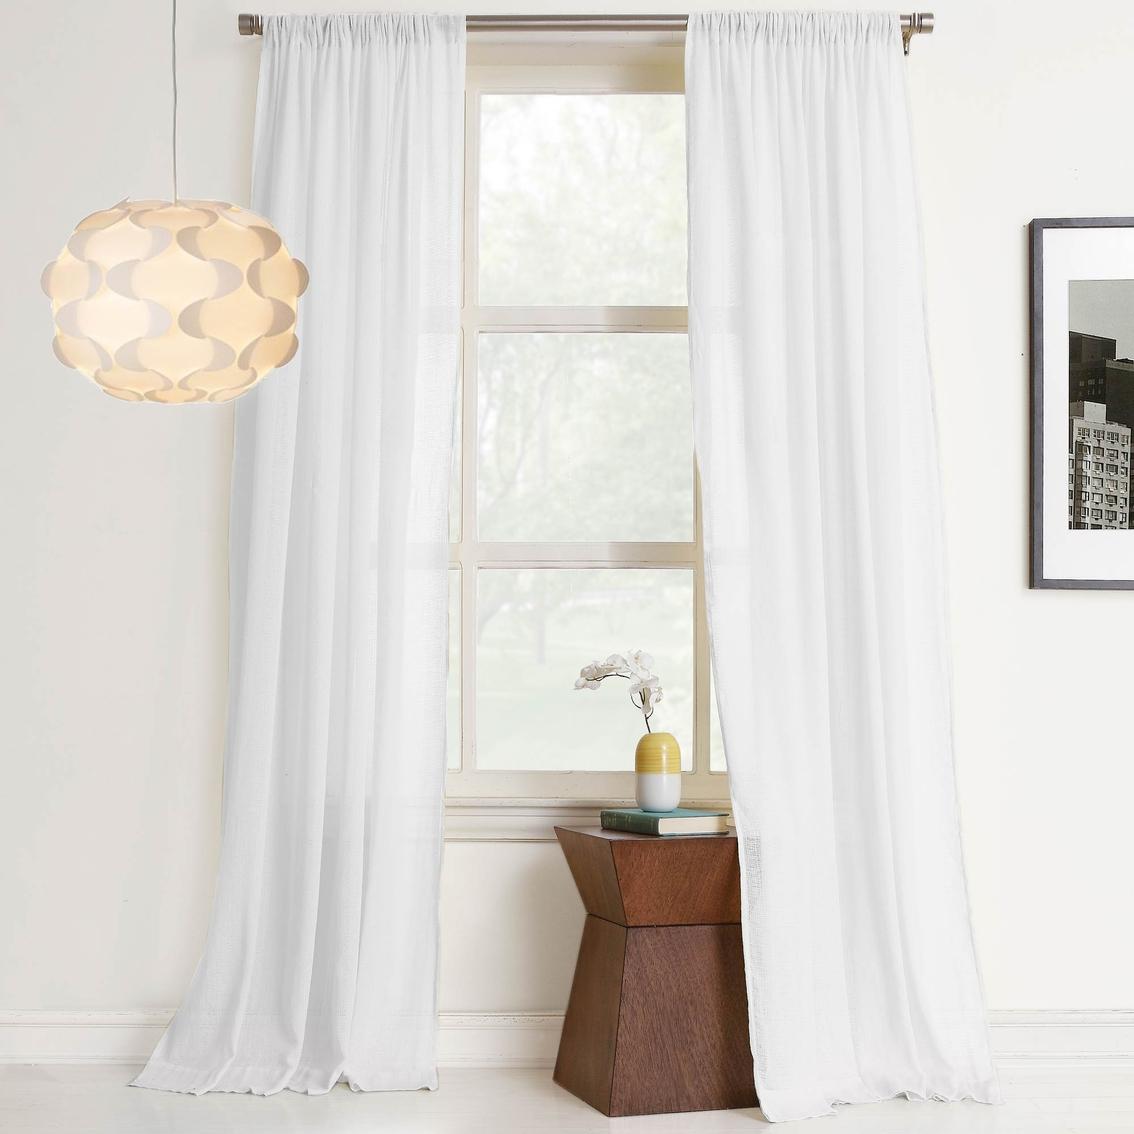 No 918 Millennial Hendricks 50 X 63 Cotton Gauze Curtain Panel